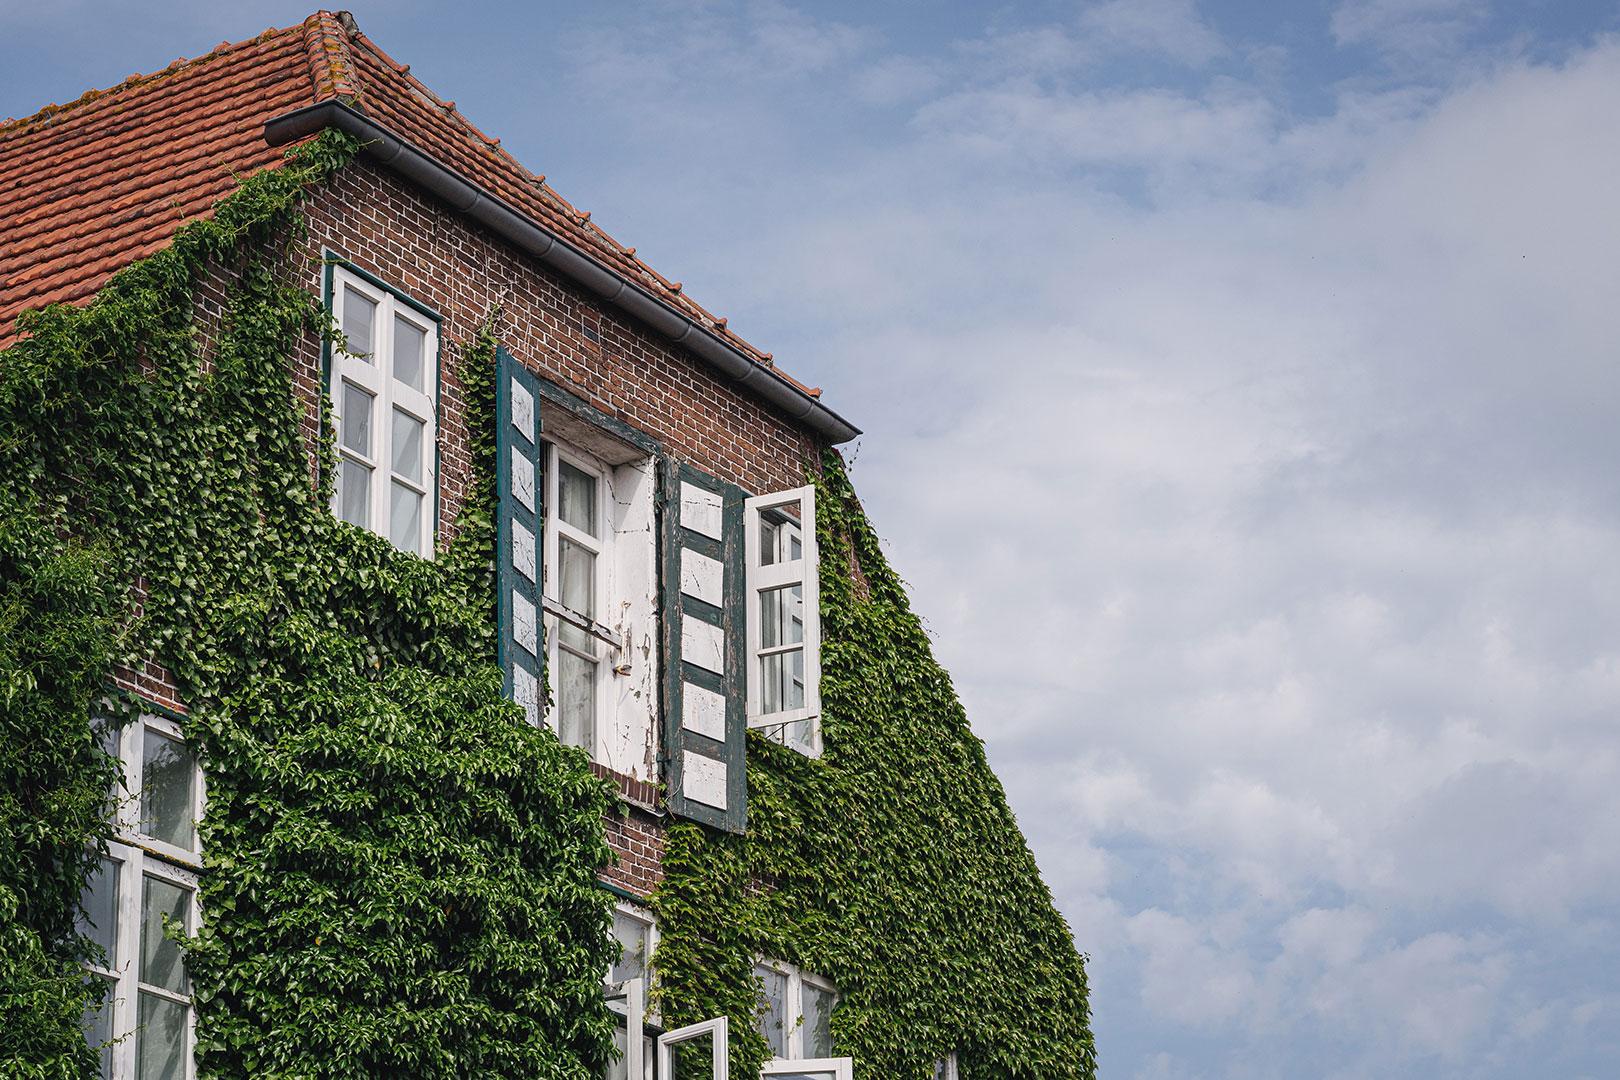 Backsteinhaus in Hooksiel